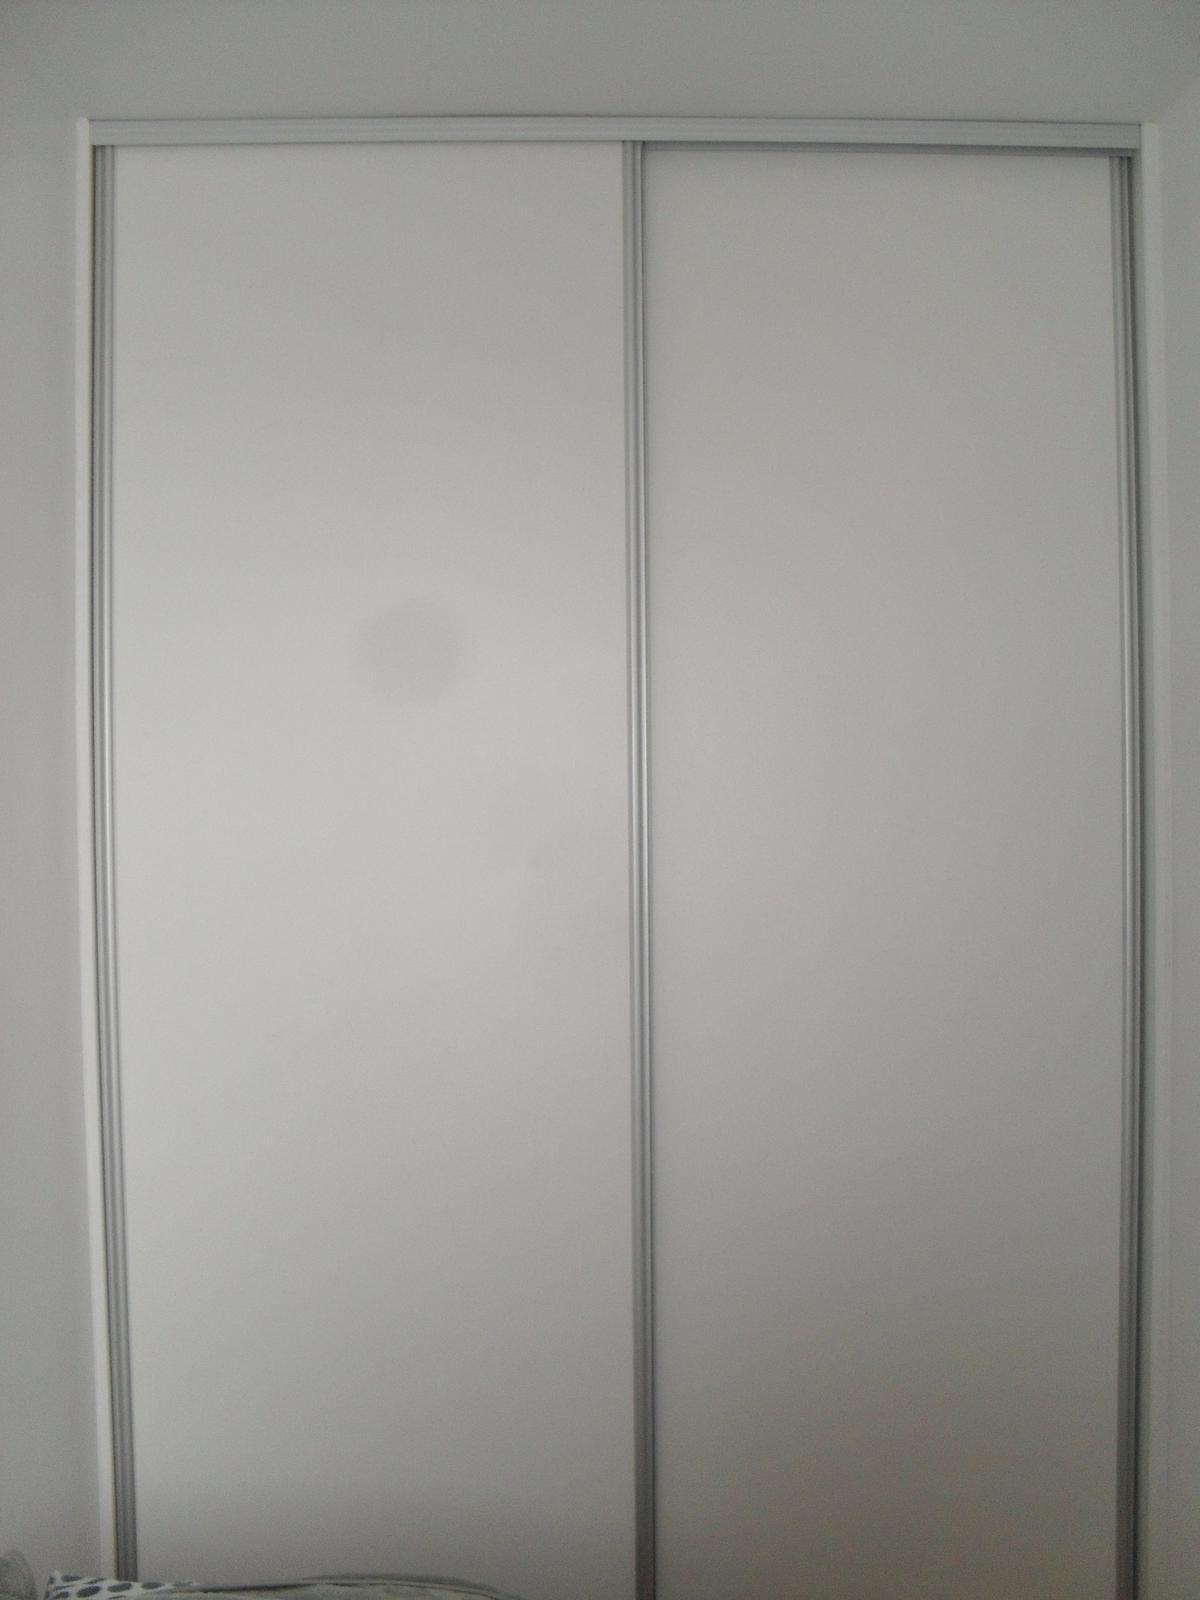 Vstavané skrine Martin Benko Bošany - Obrázok č. 49